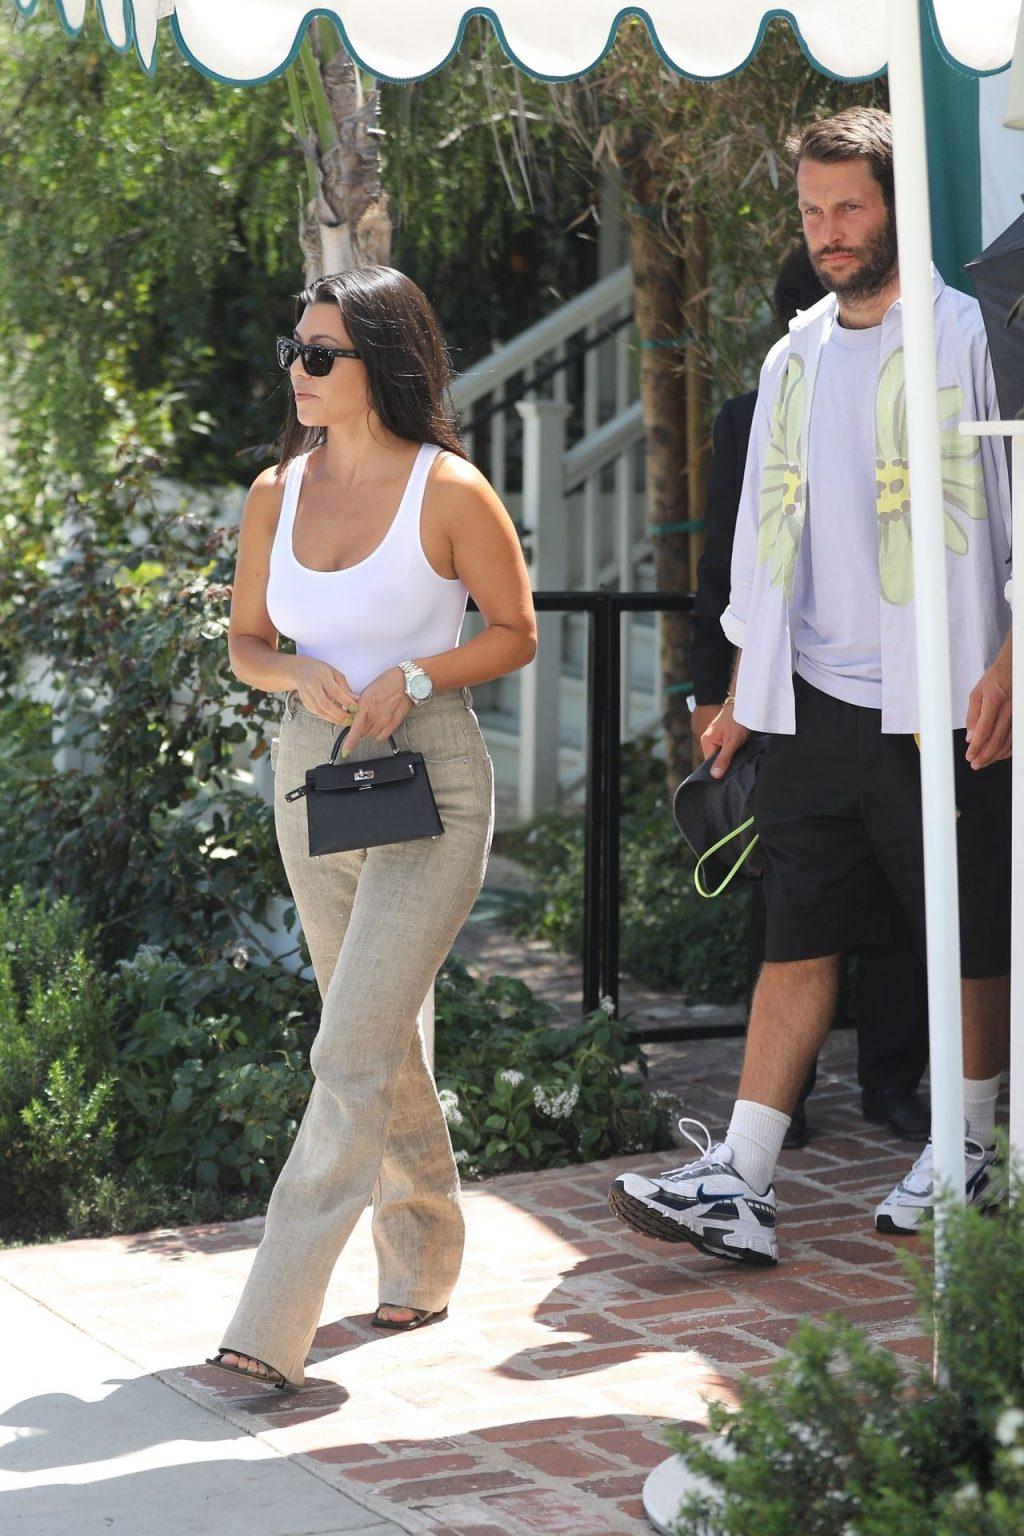 Kourtney Kardashian See Through Thefappeningblog Com 82 1024